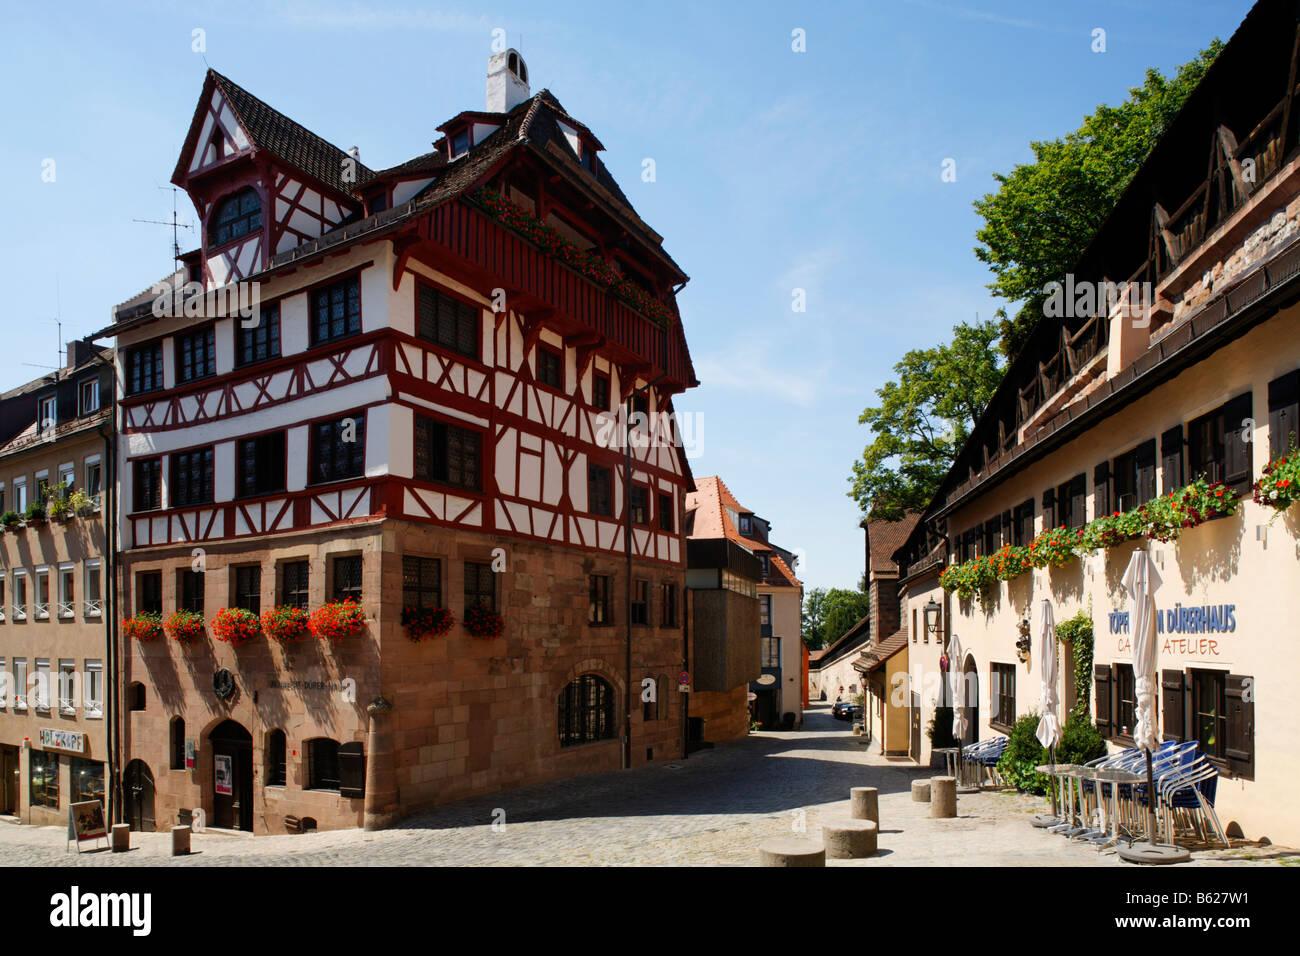 Dürer-Haus, Platz am Eingang des Zoos, historischen Stadt Zentrum, Nürnberg, Middle Franconia, Bayern, Stockbild